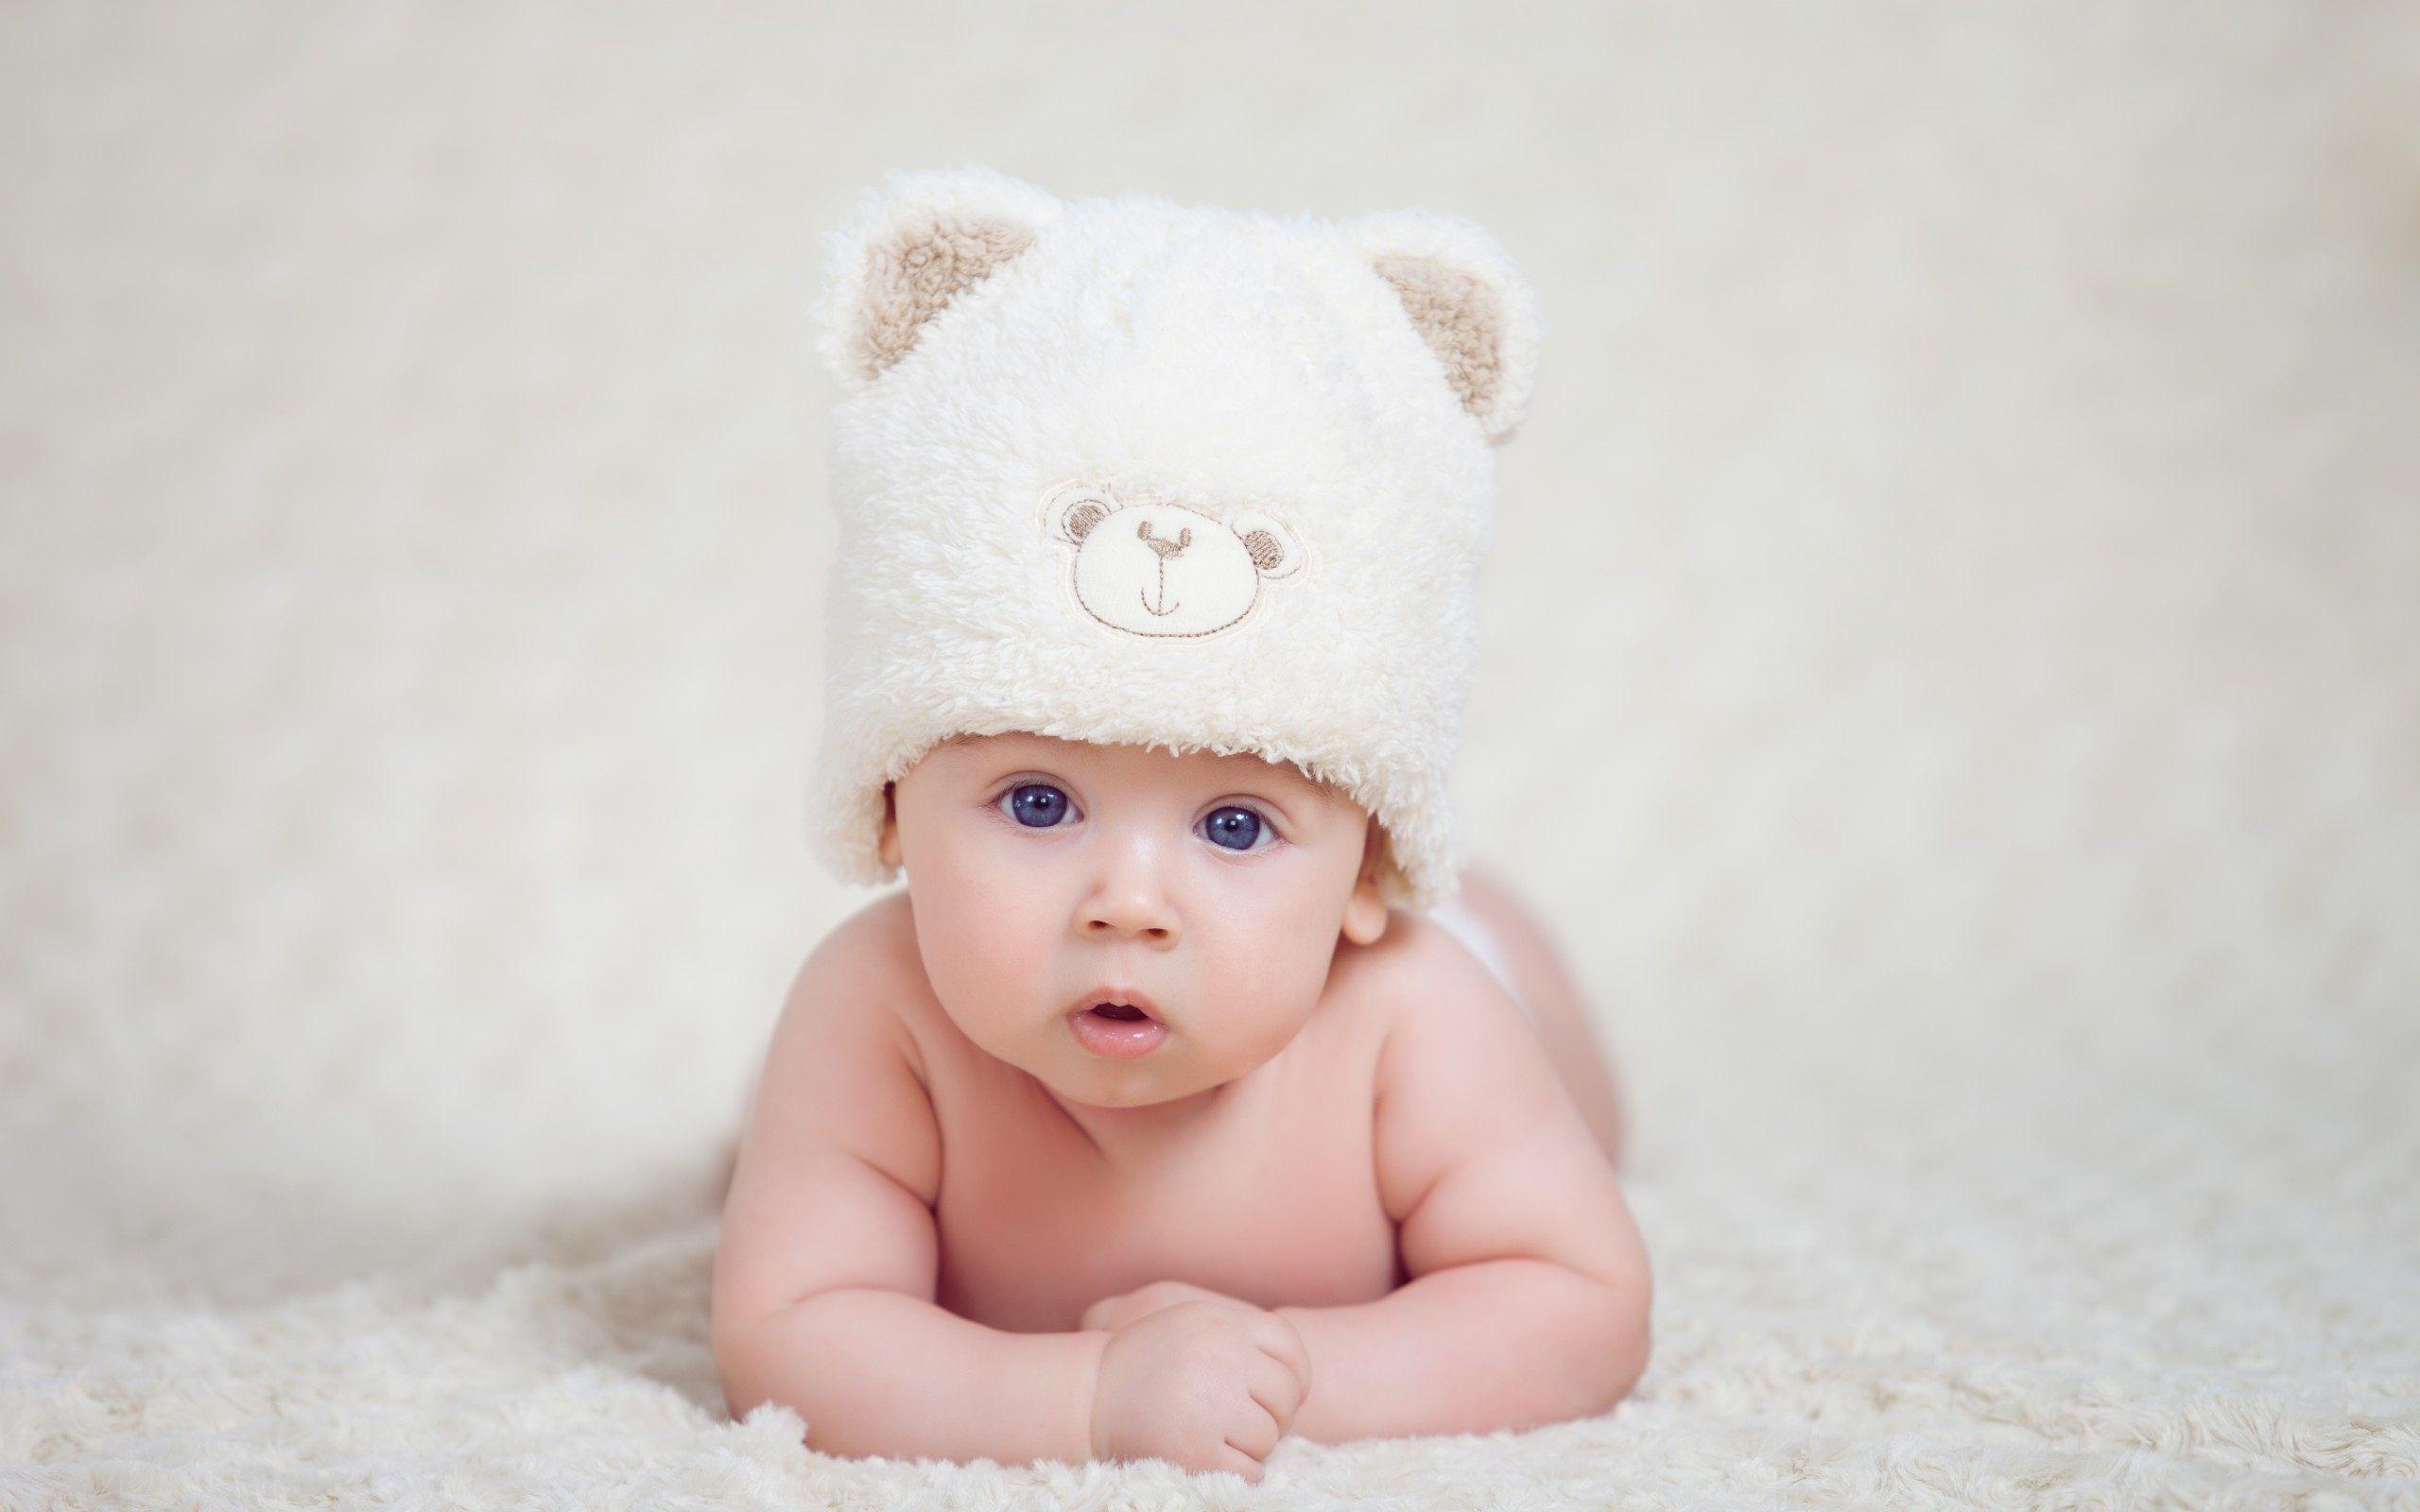 baby wallpaper high quality coreldraw scha¶ne hintern kinder